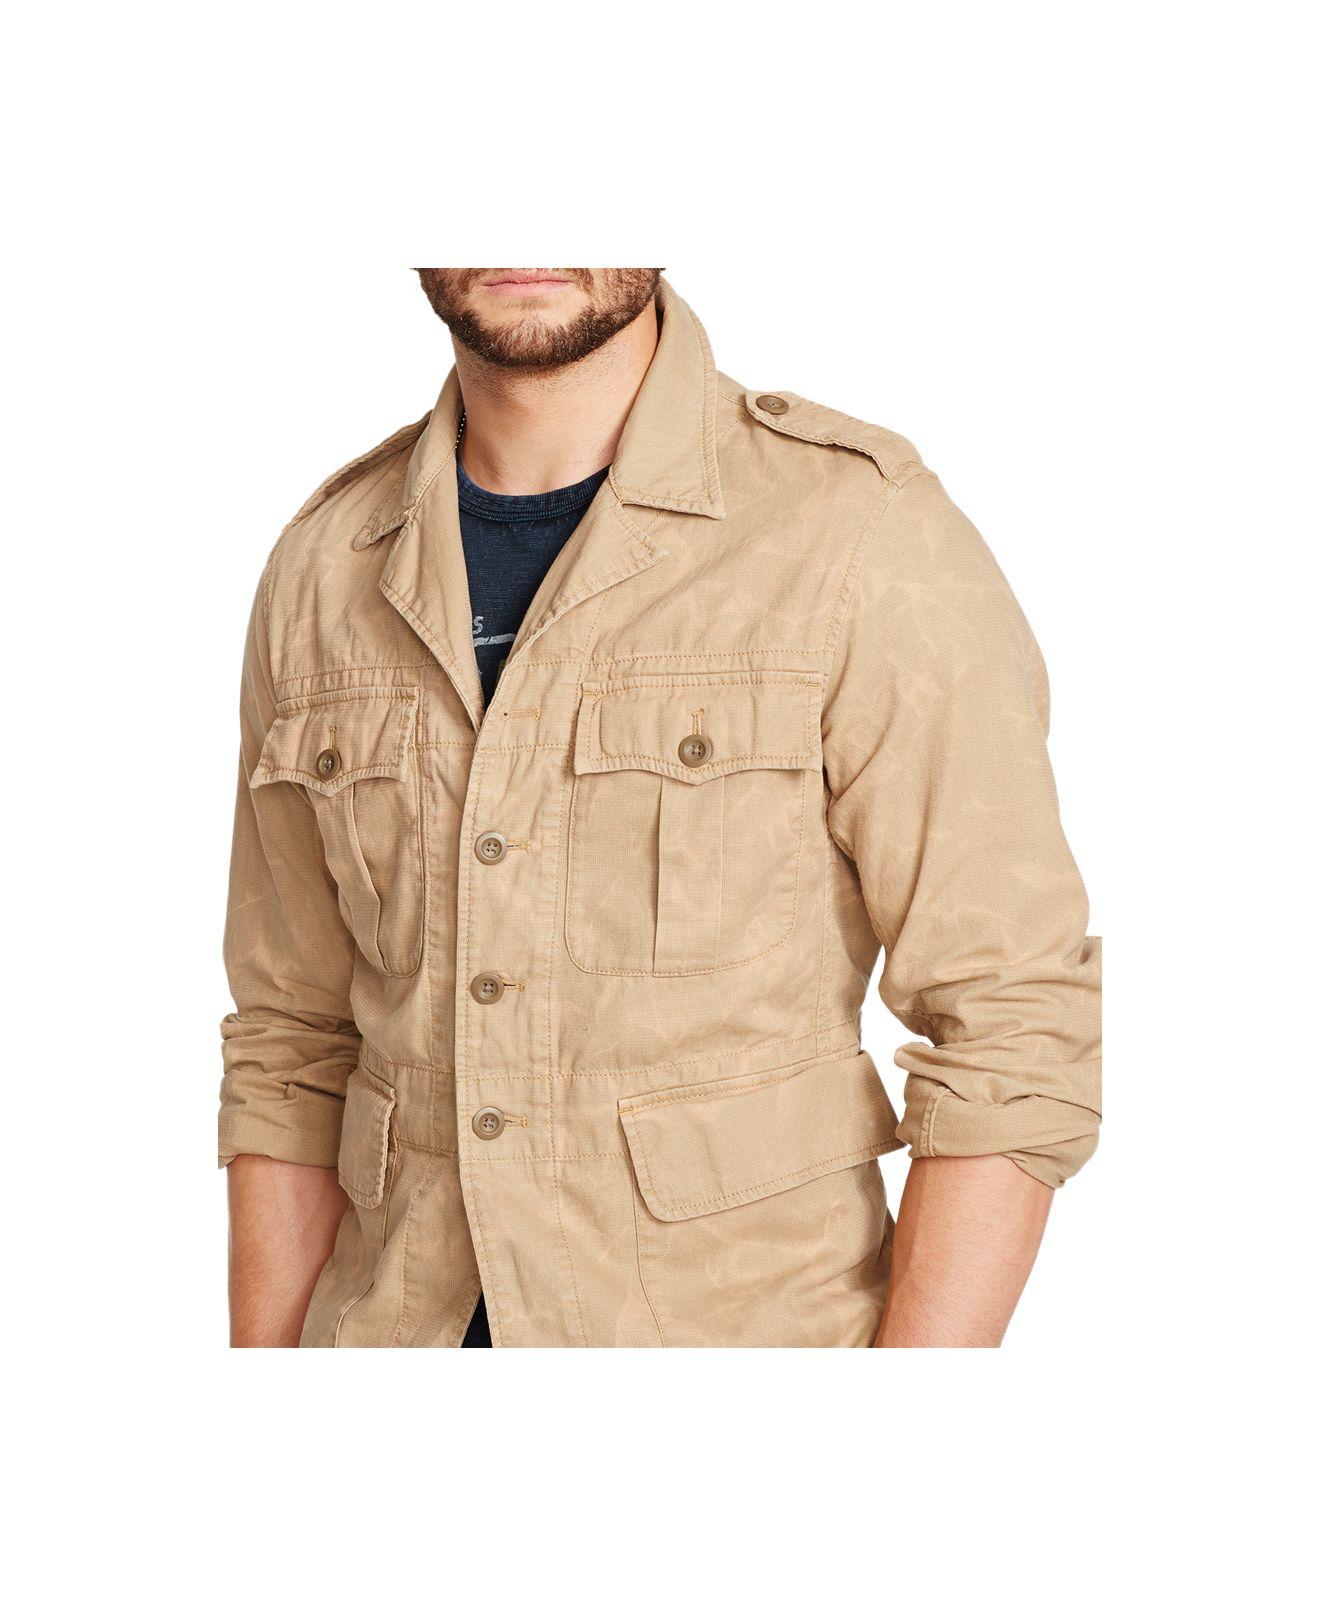 5fb2575619c denim-supply-ralph-lauren -fuana-safari-jacket-product-4-237806934-normal.jpeg